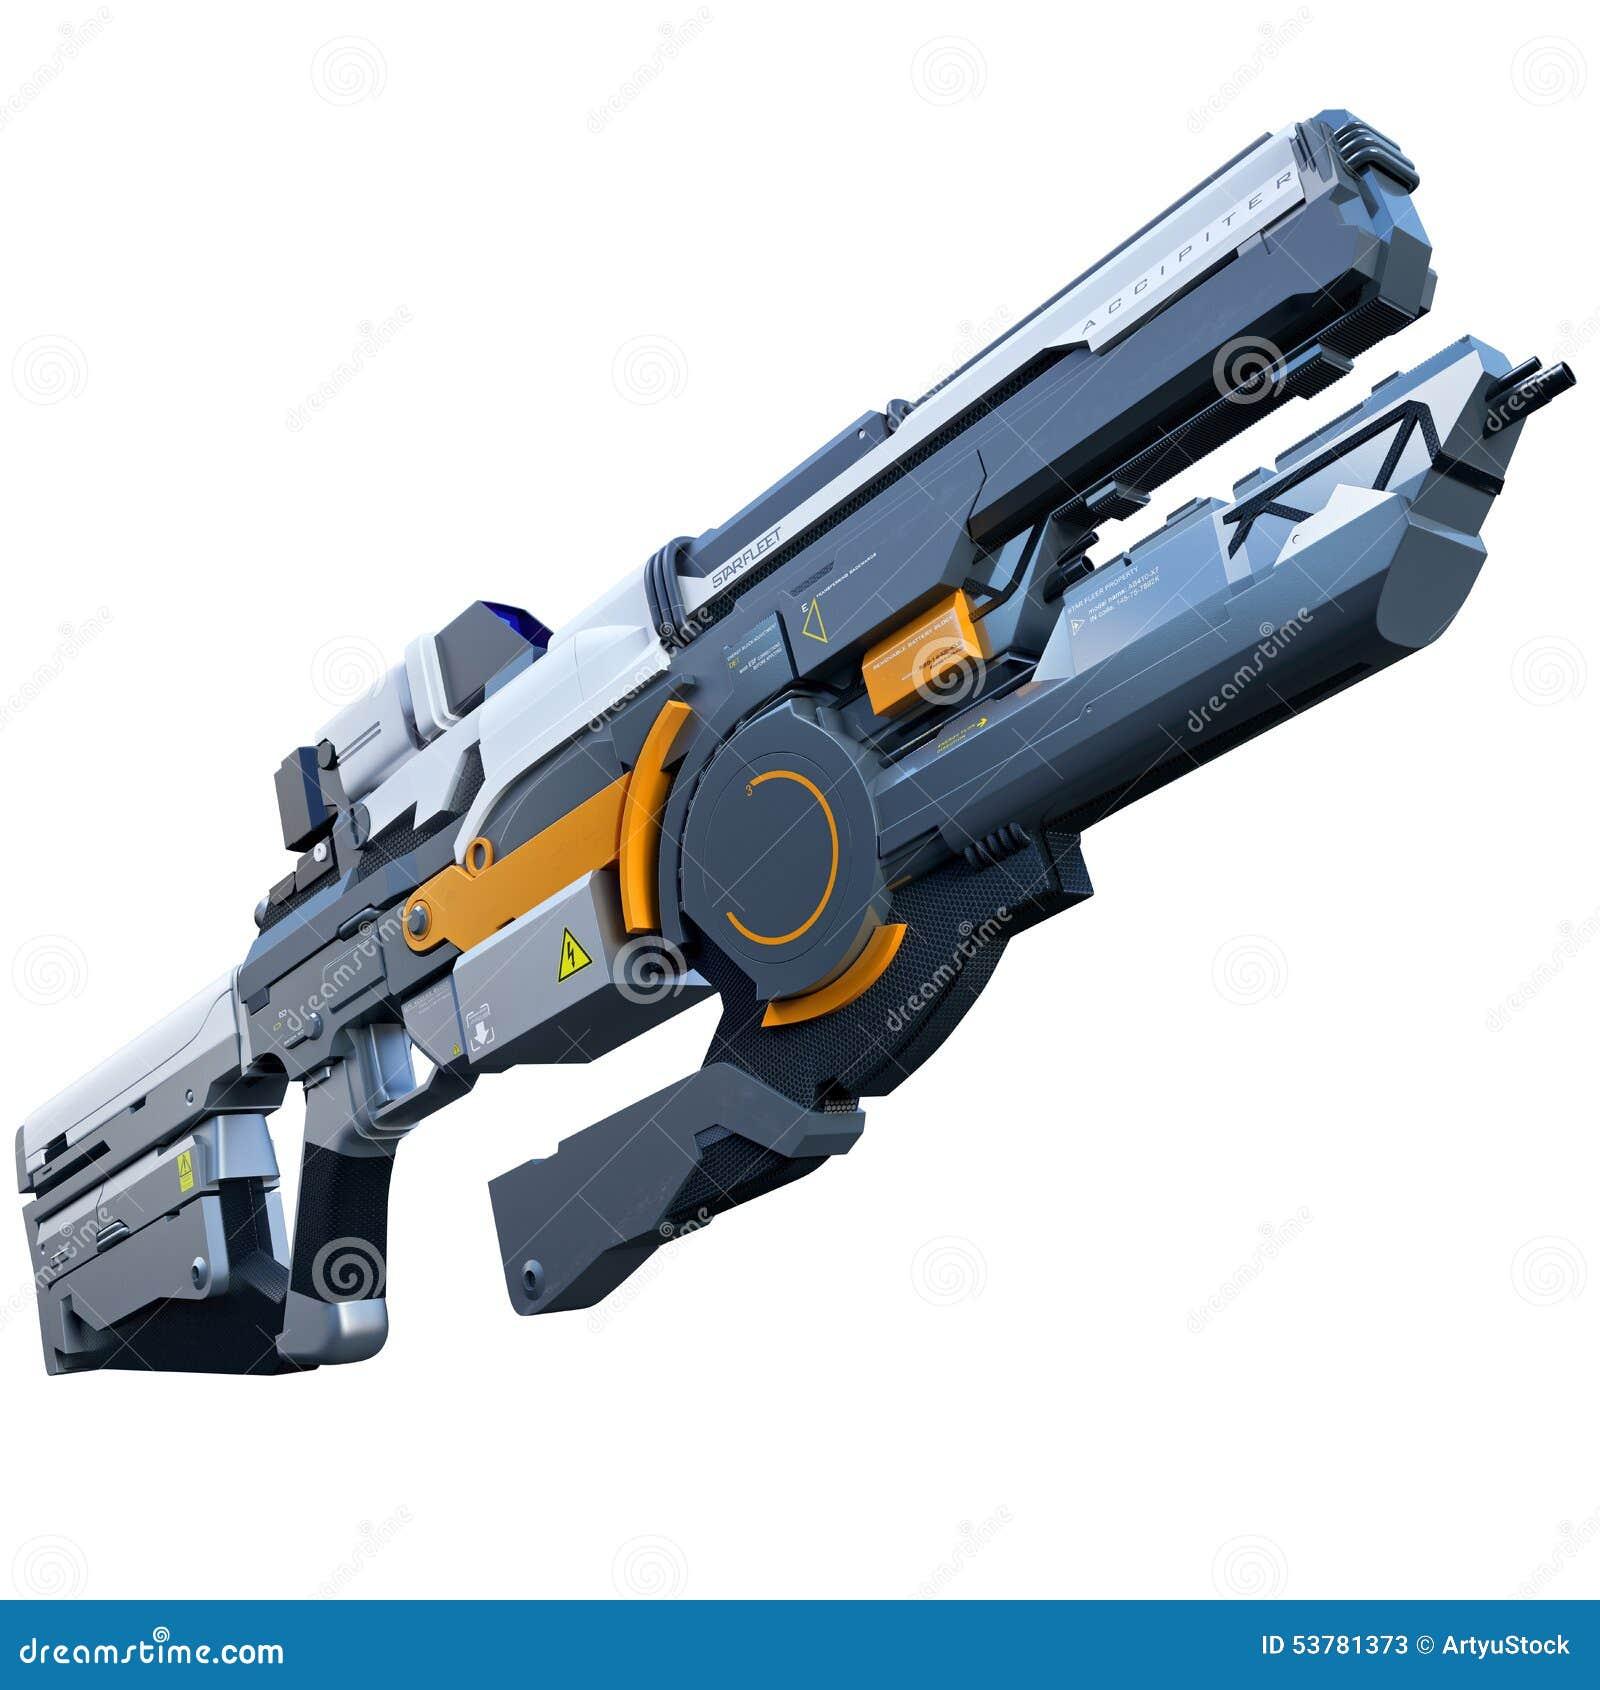 futuristic rifle stock illustration illustration of kriss vector assault rifle Assault Rifle Silhouette